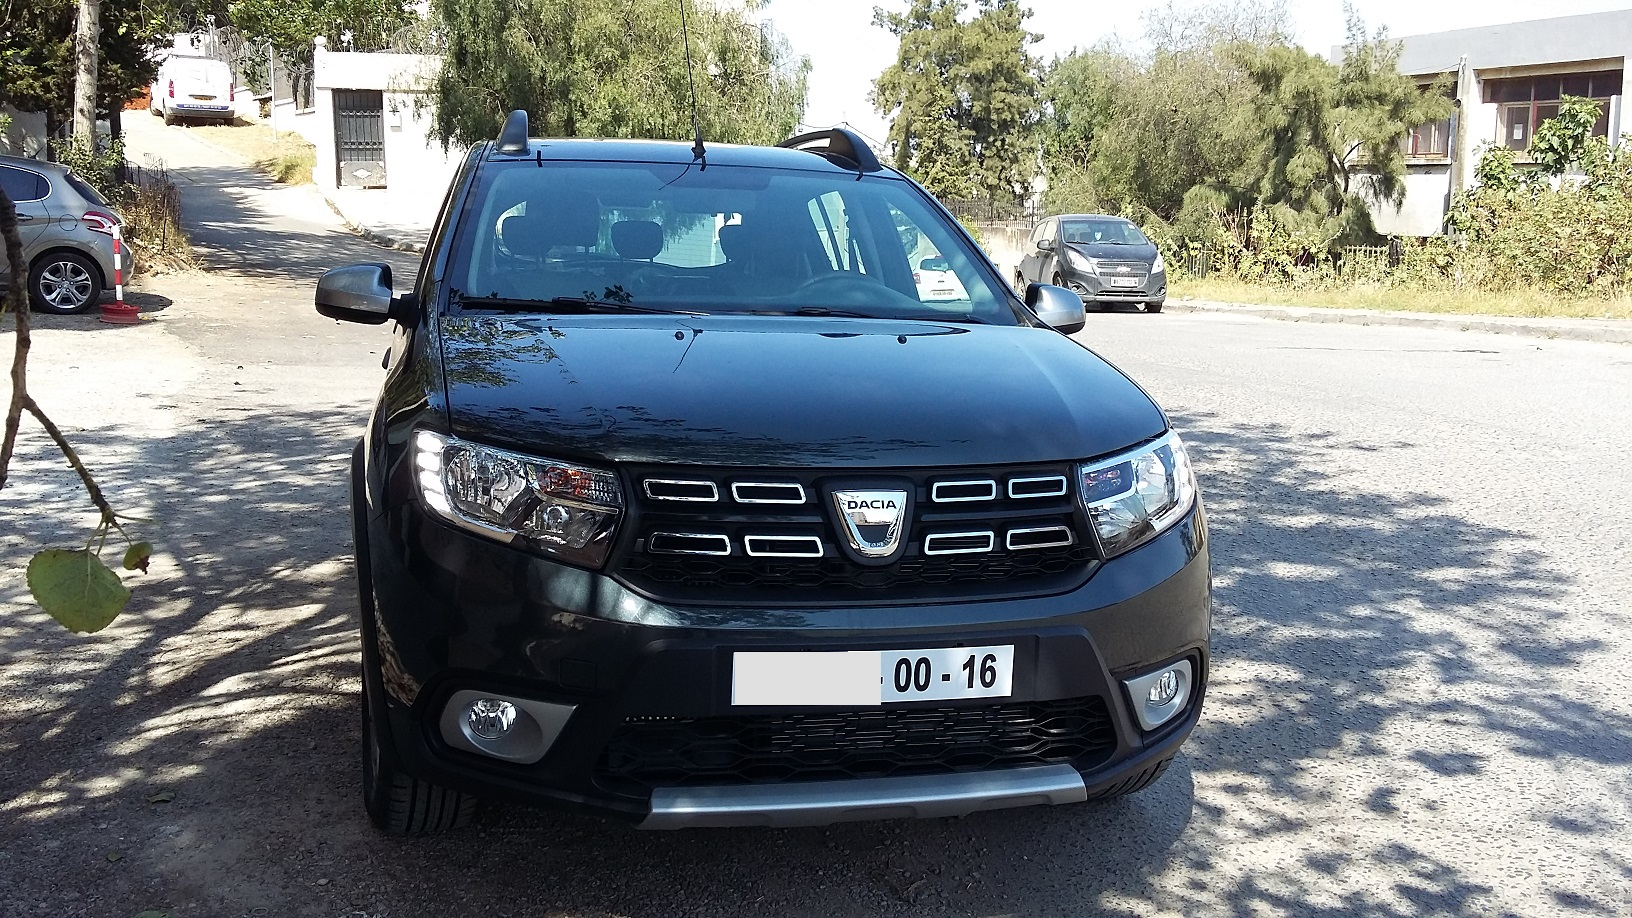 Dacia Sandero Stepway restylée 2017 ouedkniss